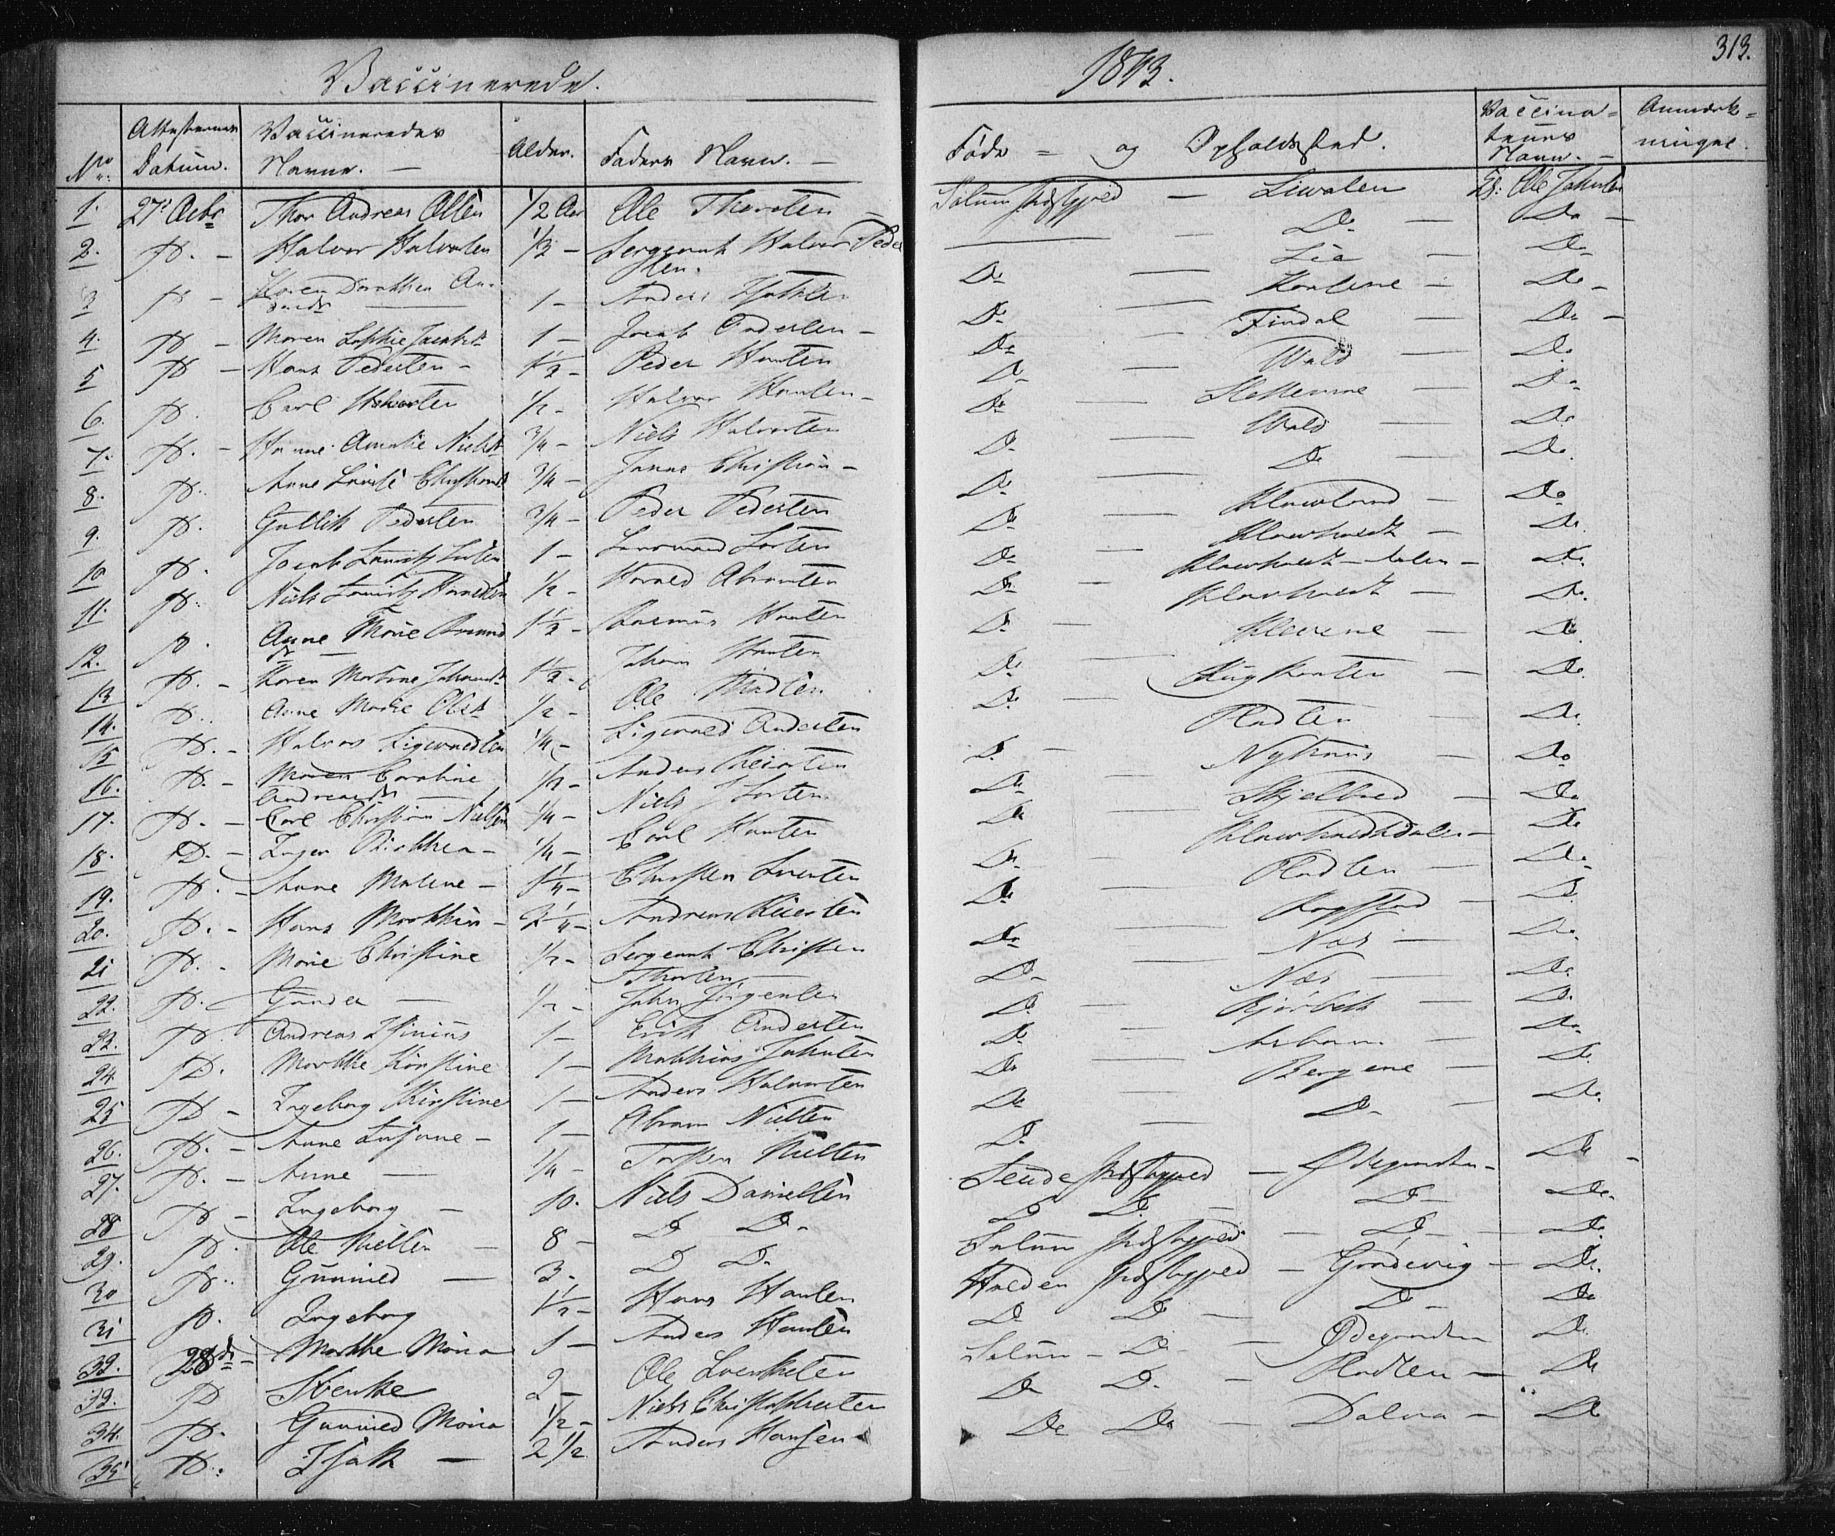 SAKO, Solum kirkebøker, F/Fa/L0005: Ministerialbok nr. I 5, 1833-1843, s. 313